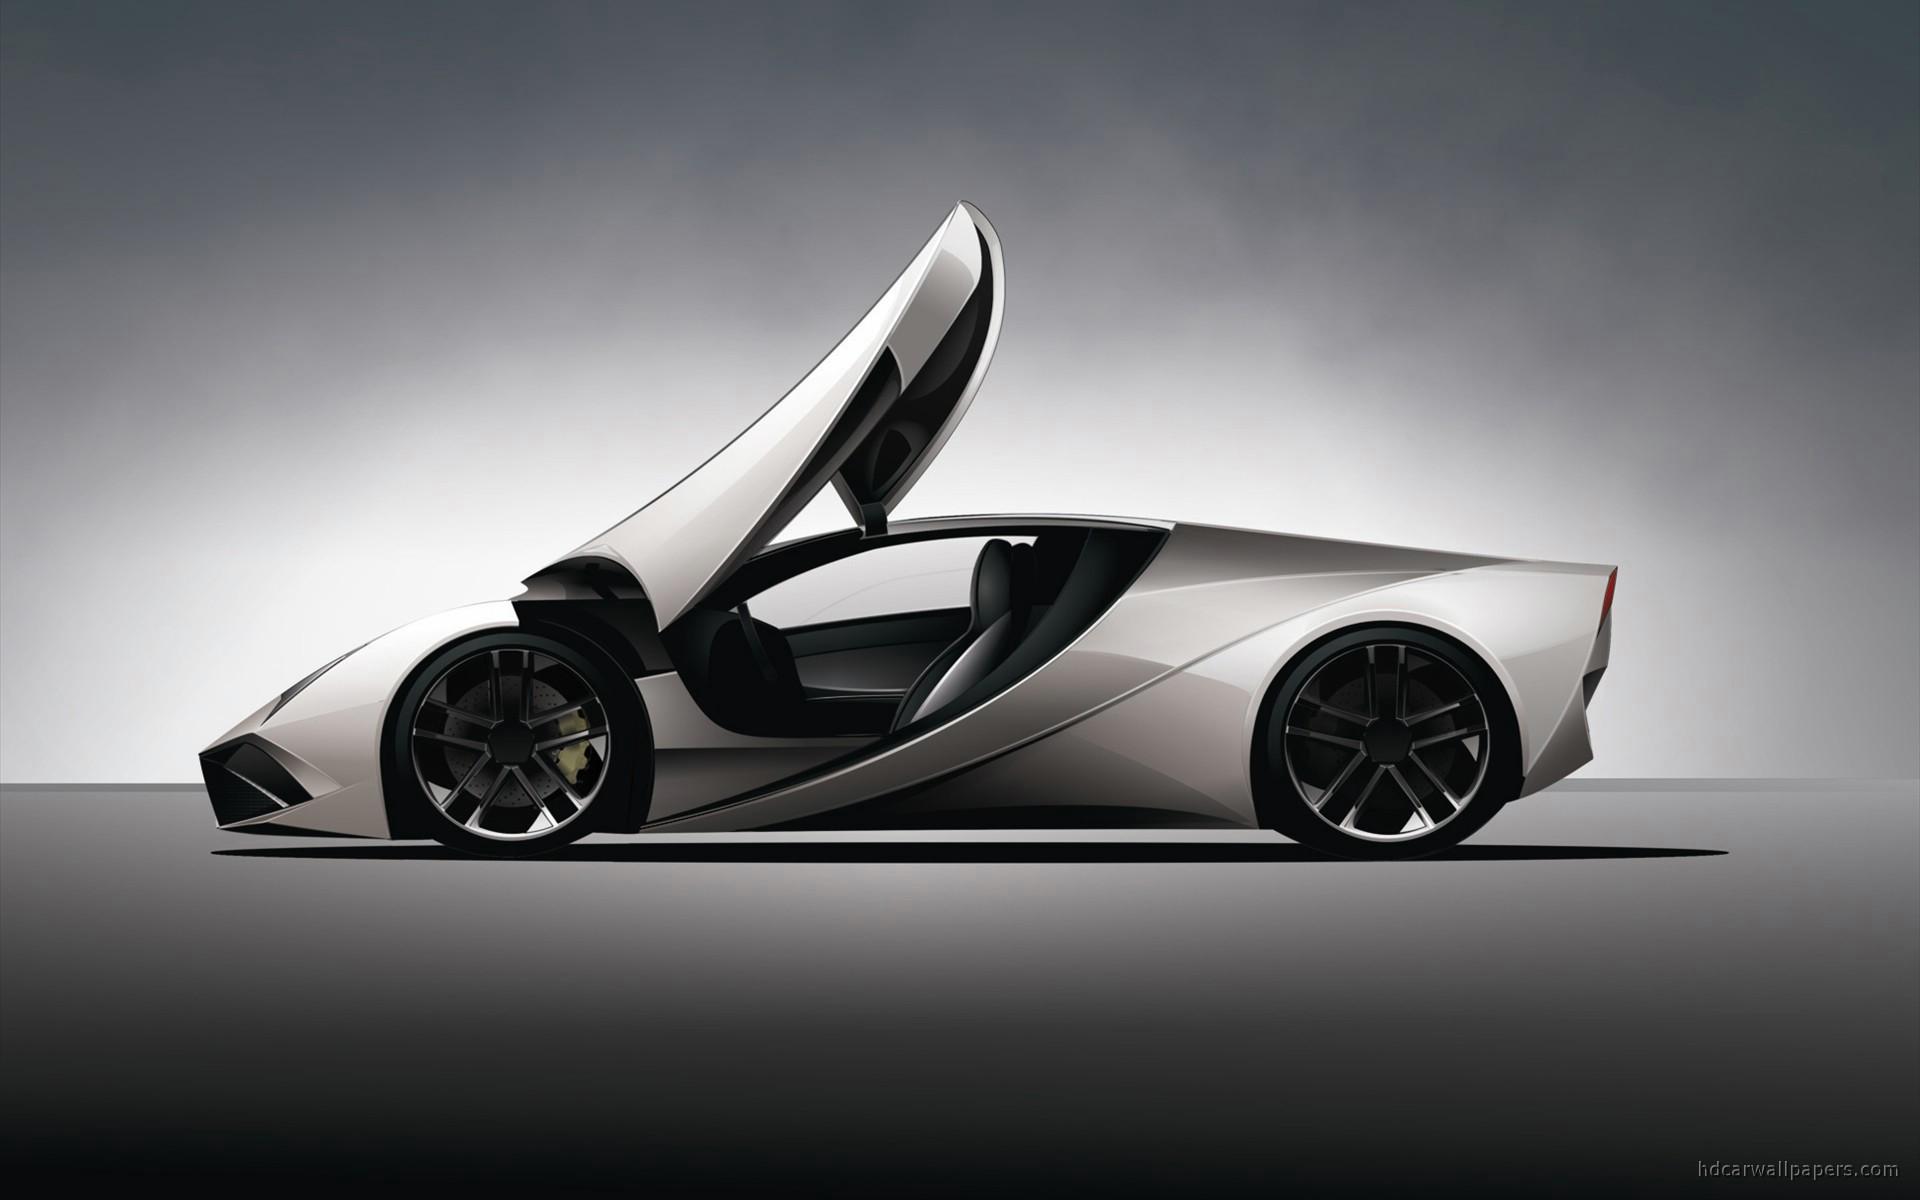 Lamborghini Concept Wallpaper Hd Car Wallpapers Id 914